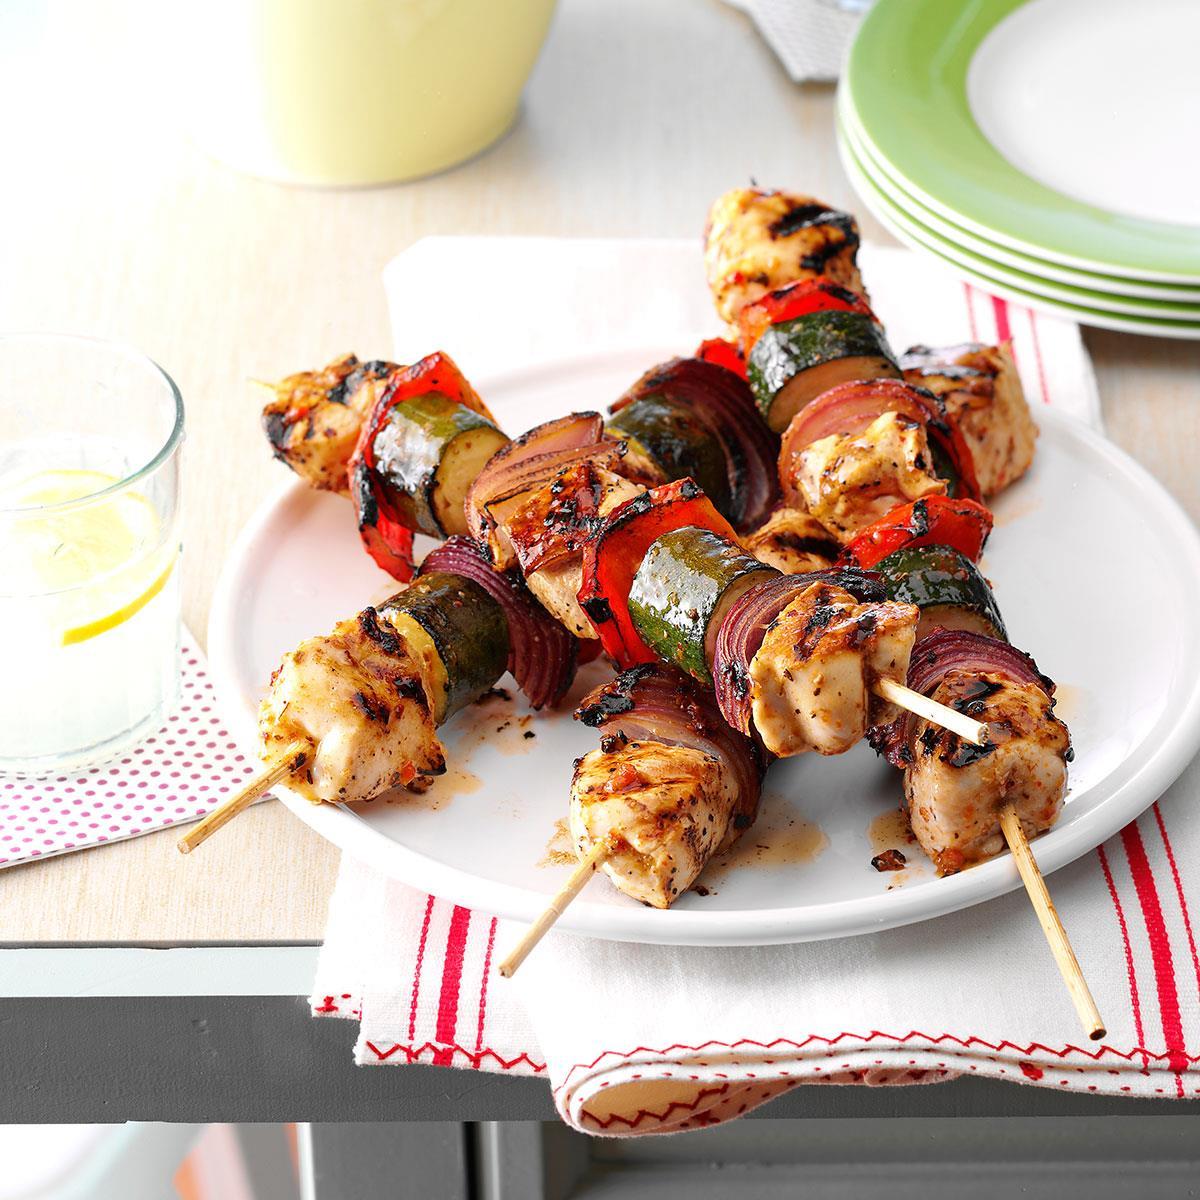 Chicken & Vegetable Kabobs image